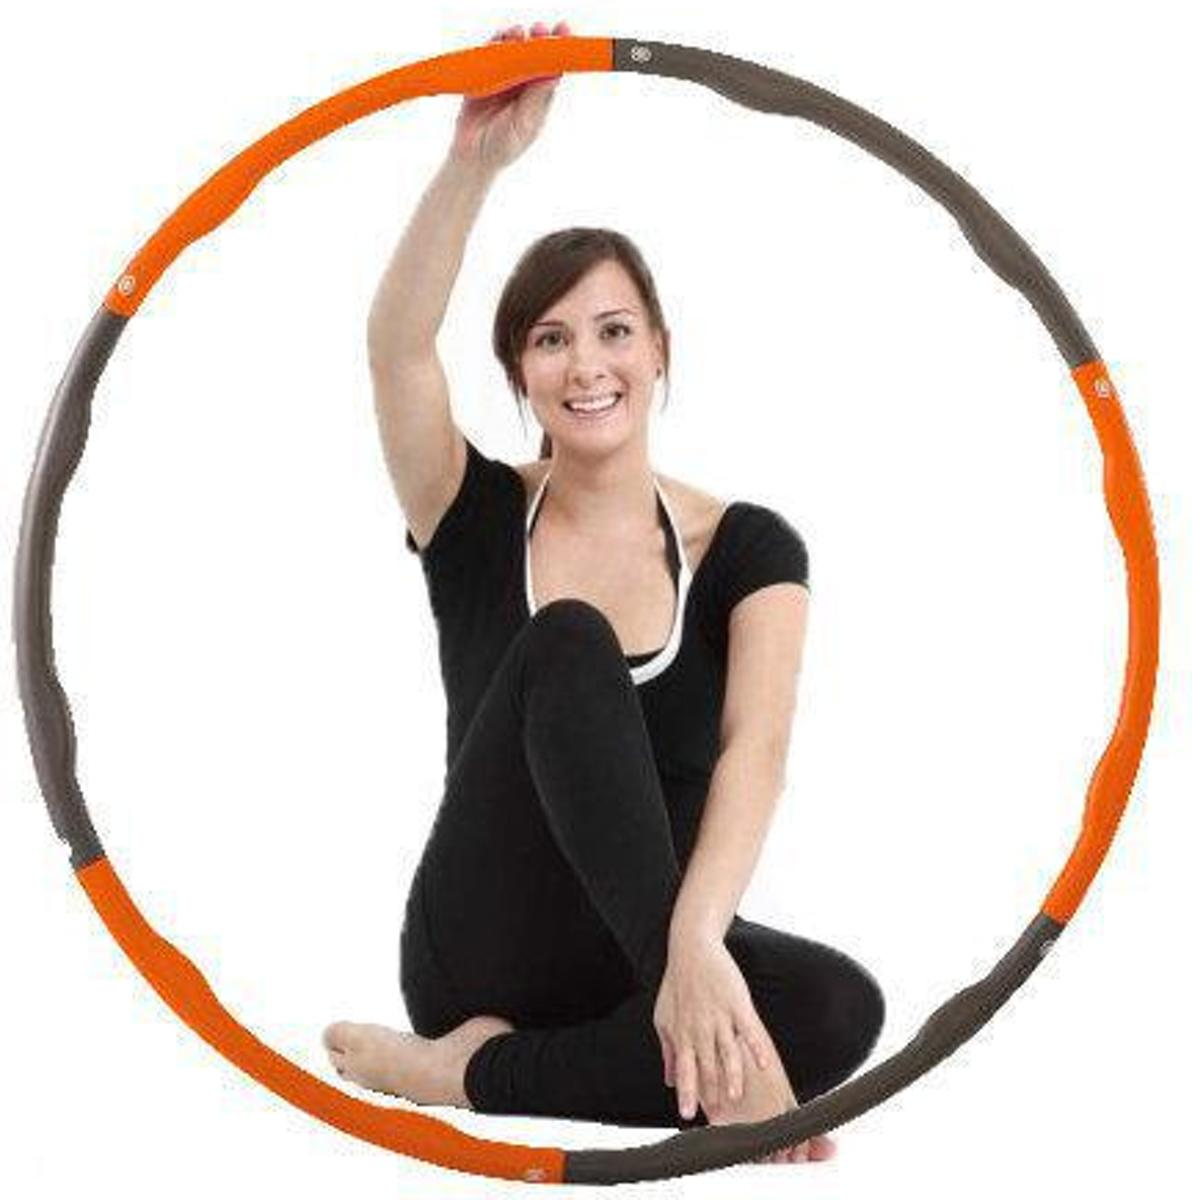 Weight hoop Soft - Fitness Hoelahoep - 1.2 kg - Ø 100 cm - Oranje/Grijs kopen